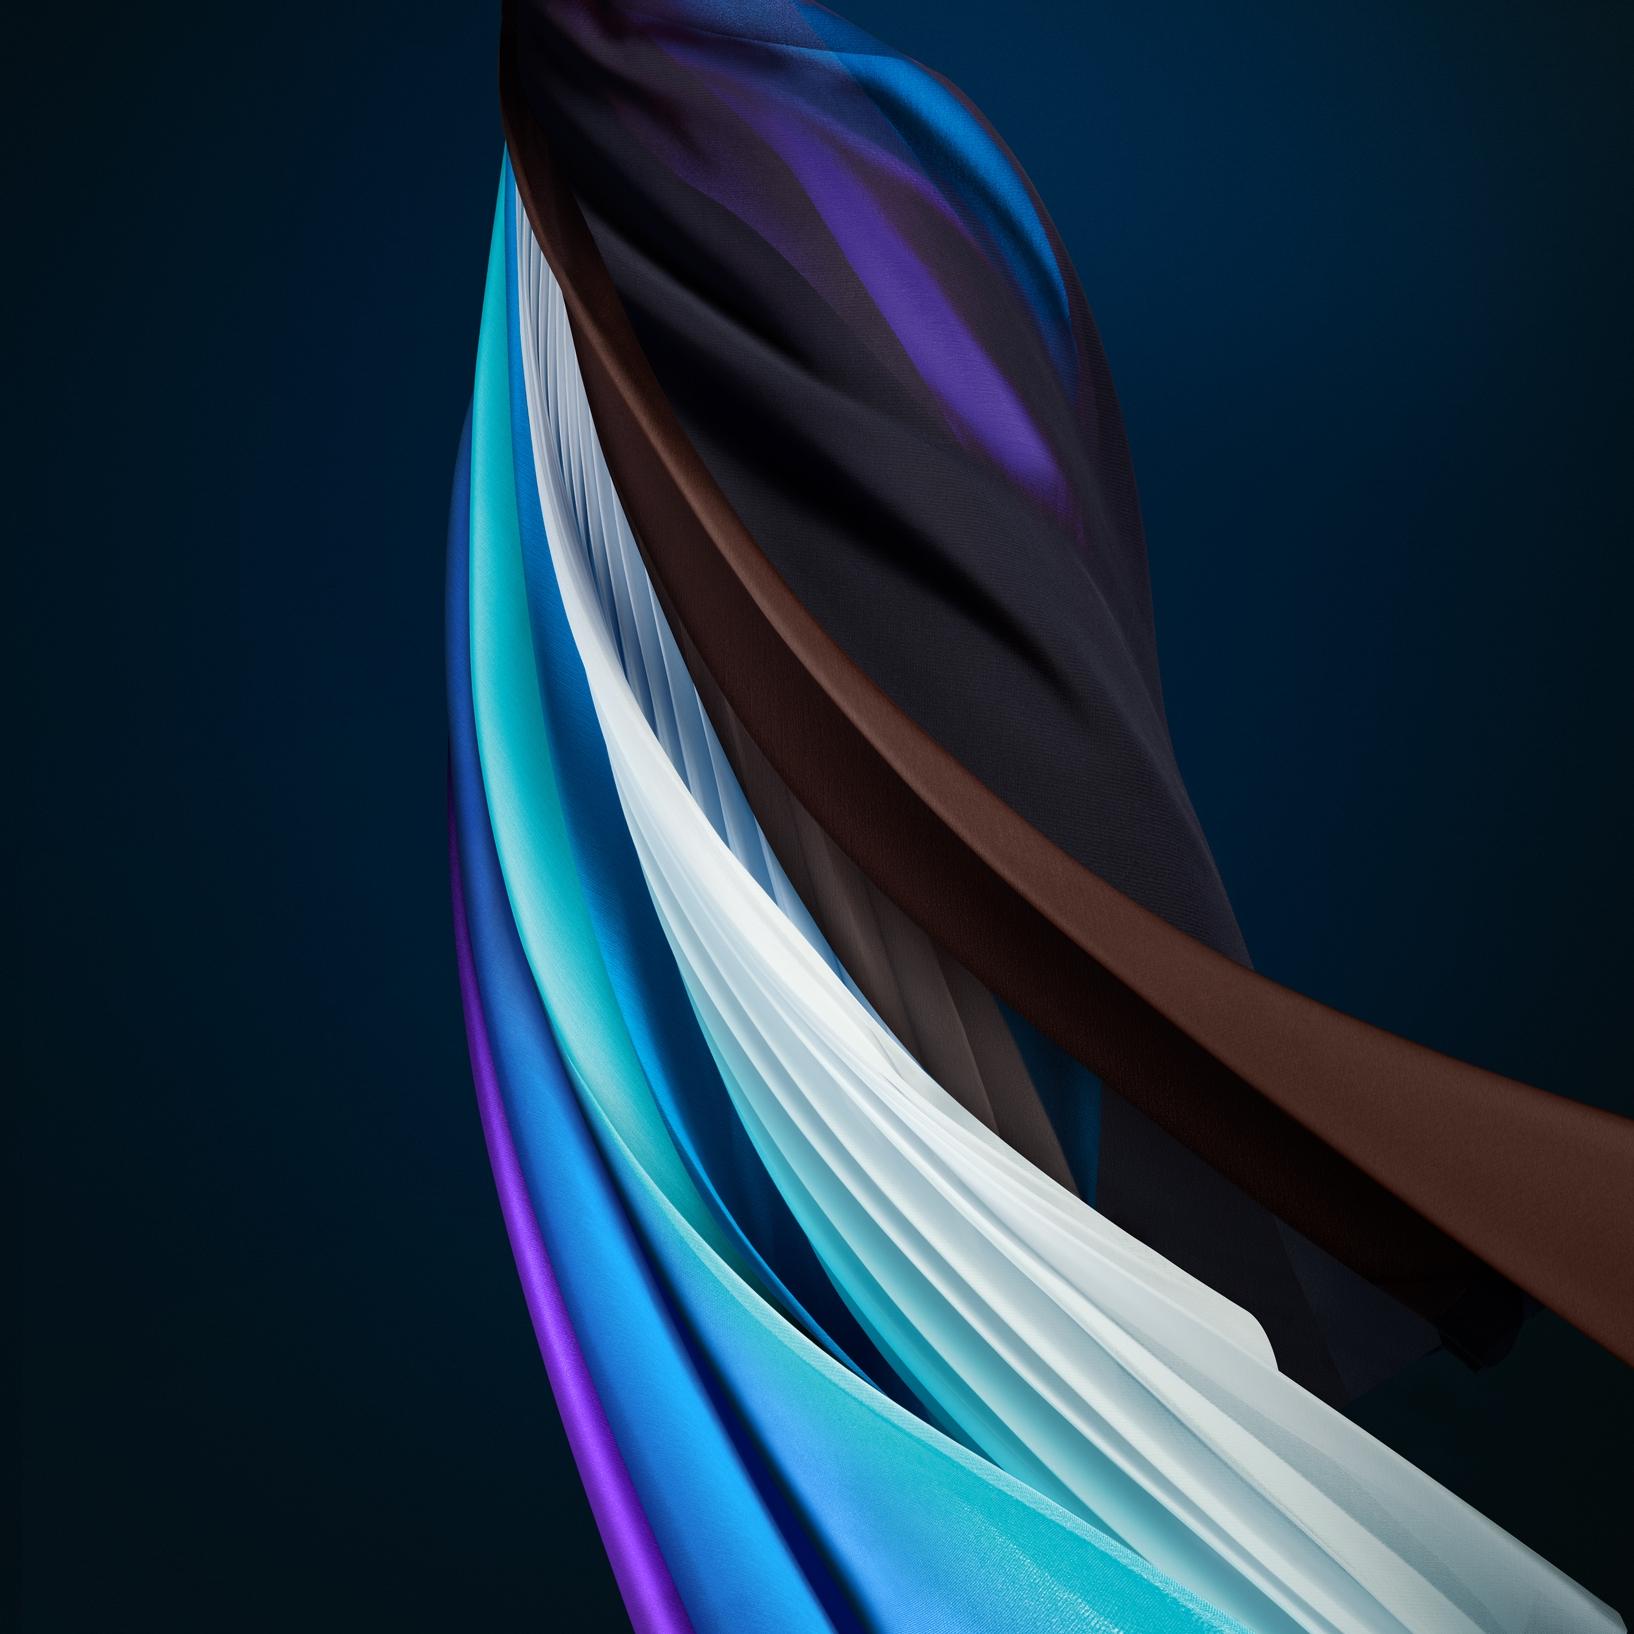 Silk_Blue_Light- iPhone SE 2020 - TechFoogle